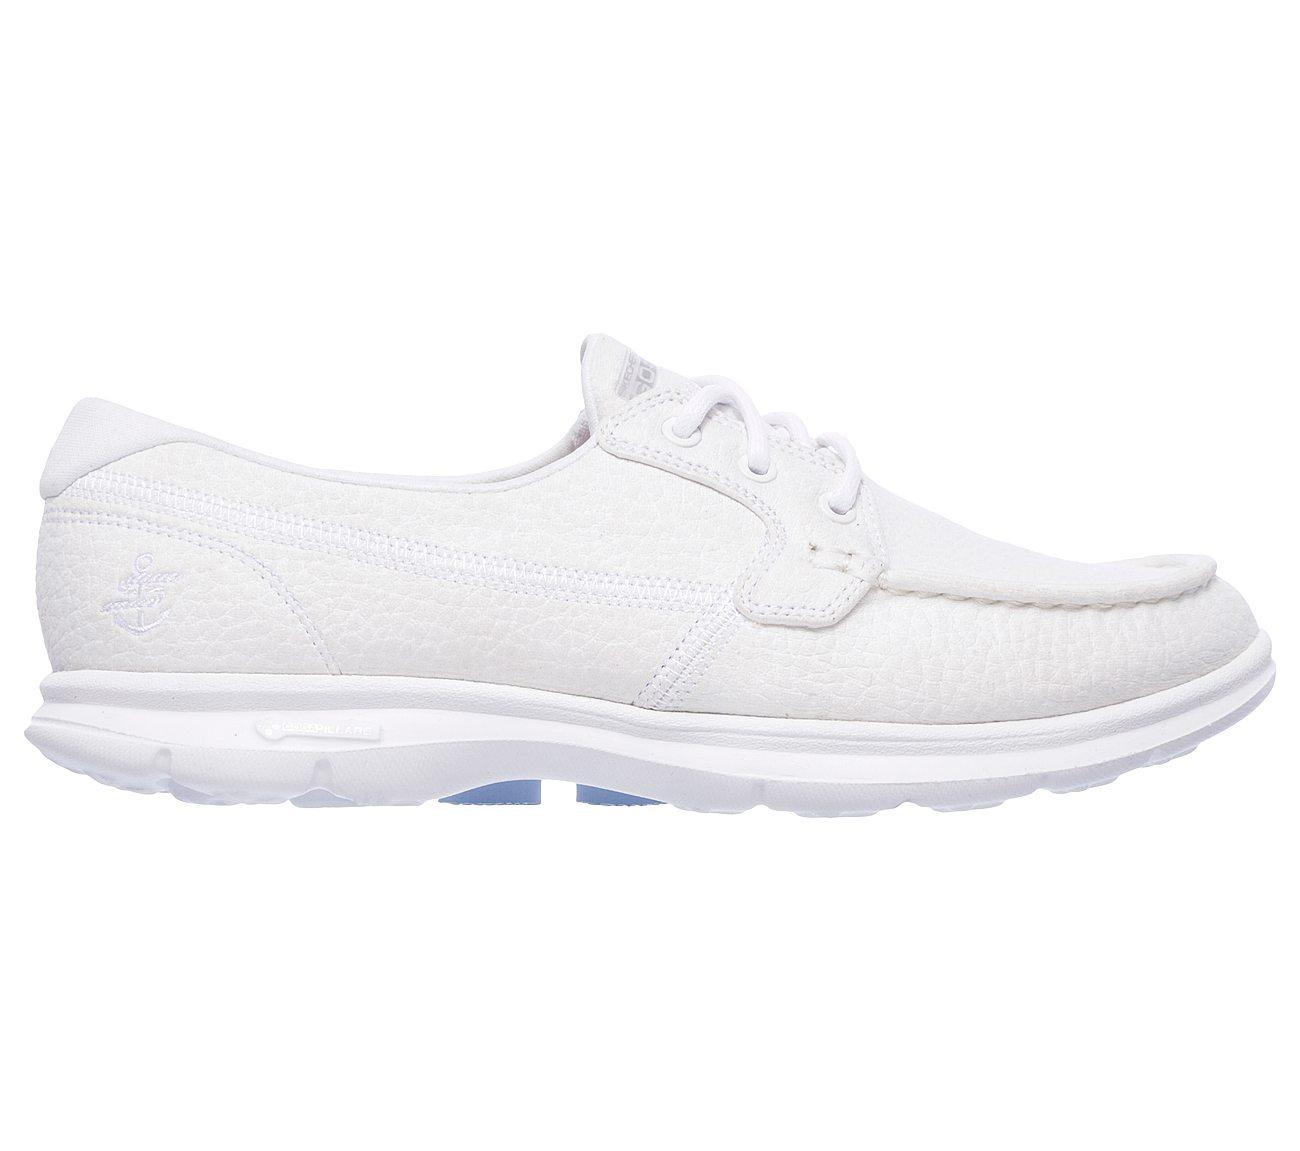 Buy SKECHERS Skechers GO STEP - Riptide Skechers Performance Shoes only  $64.00